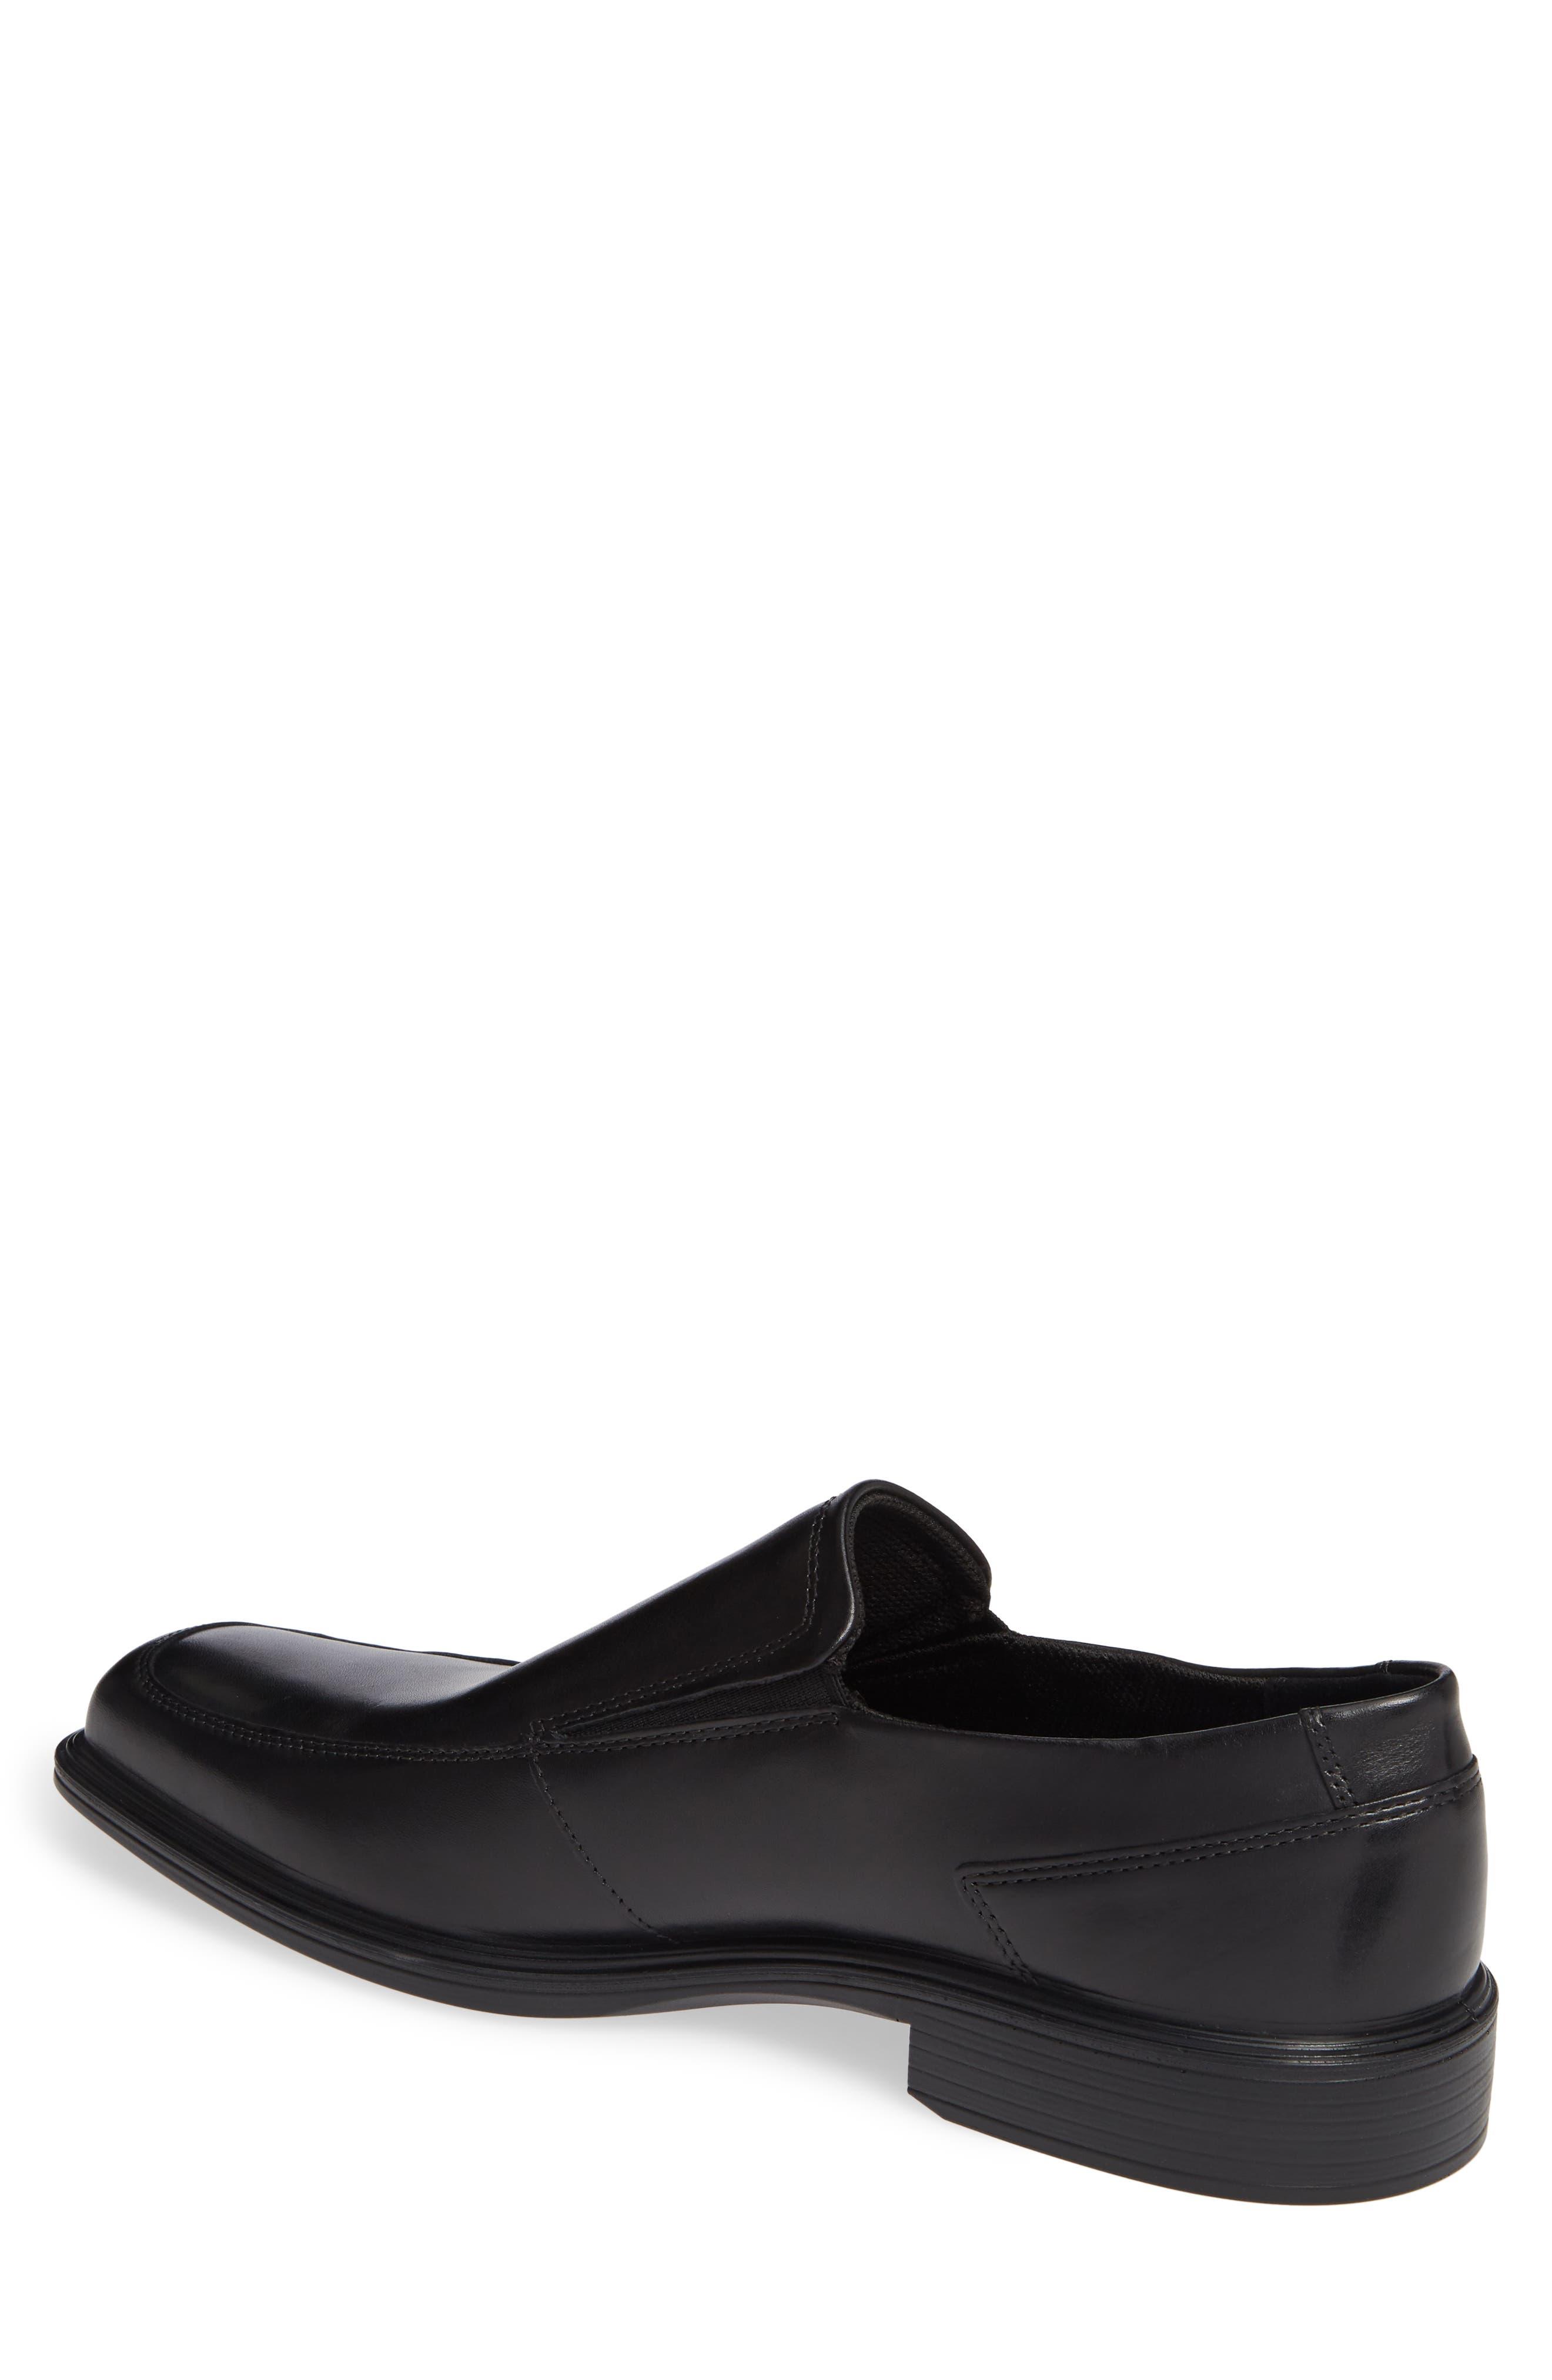 Minneapolis Venetian Loafer,                             Alternate thumbnail 2, color,                             BLACK/BLACK LEATHER